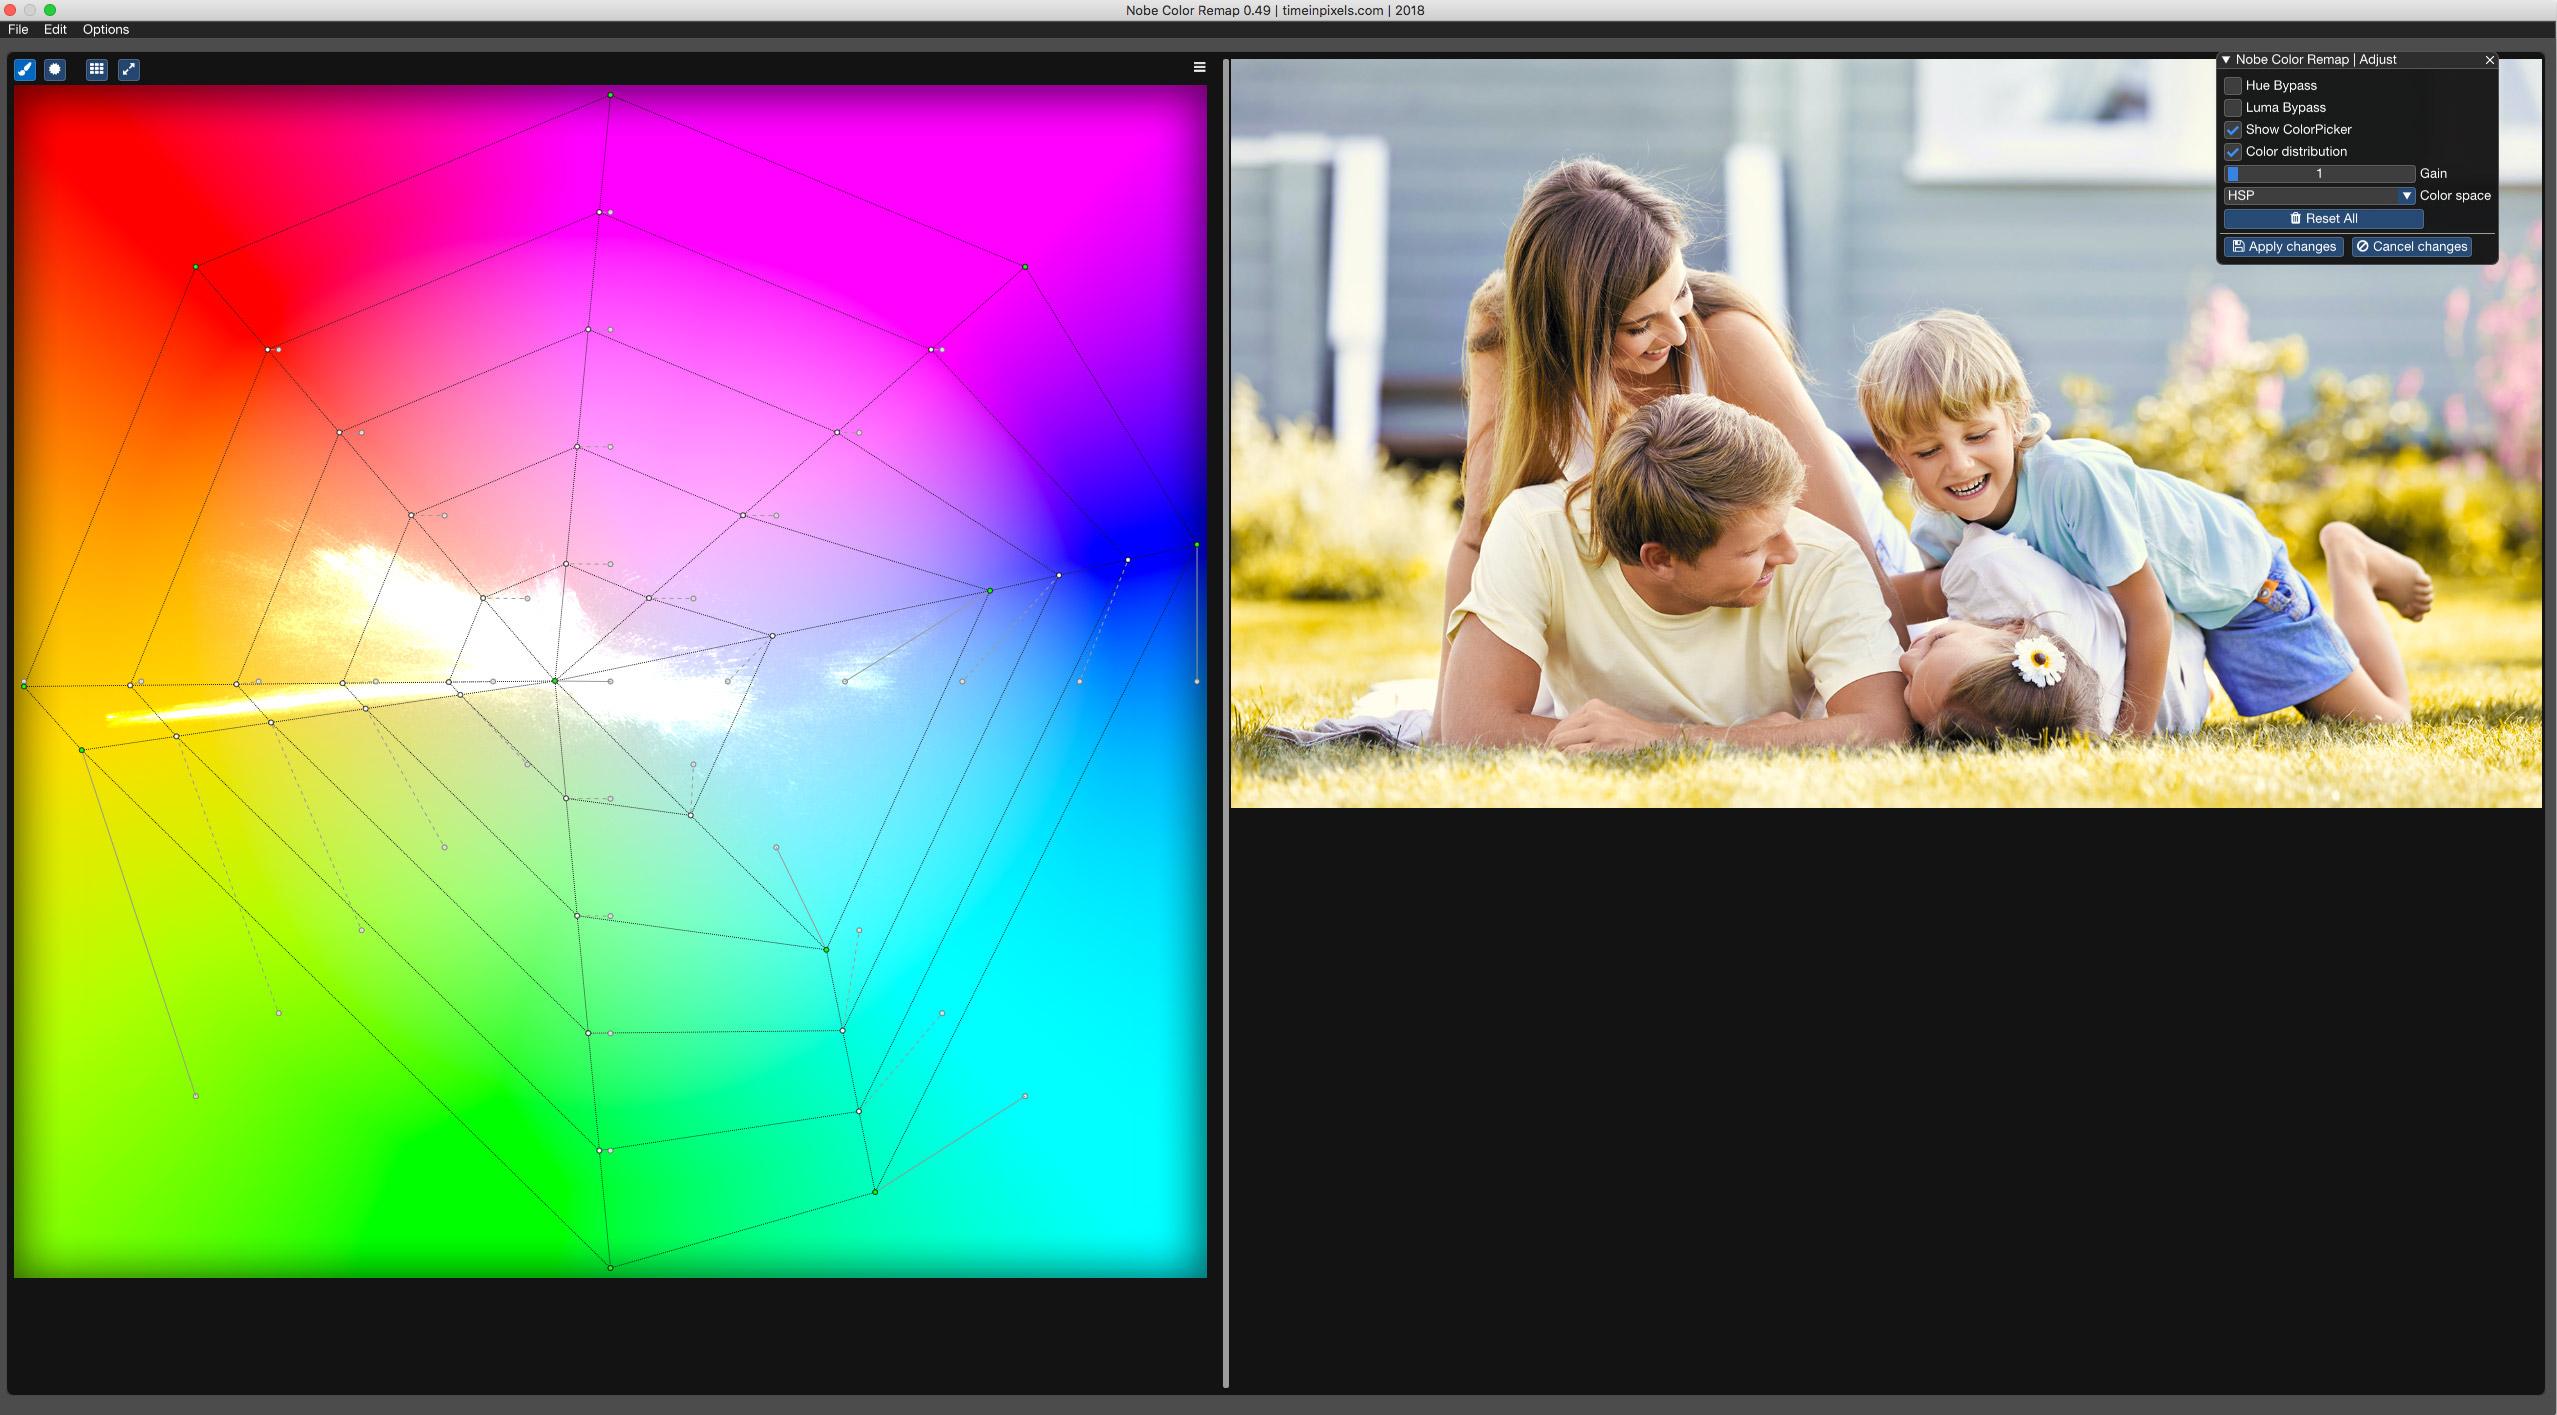 Nobe Color Remapプラグイン ウィンドウモード